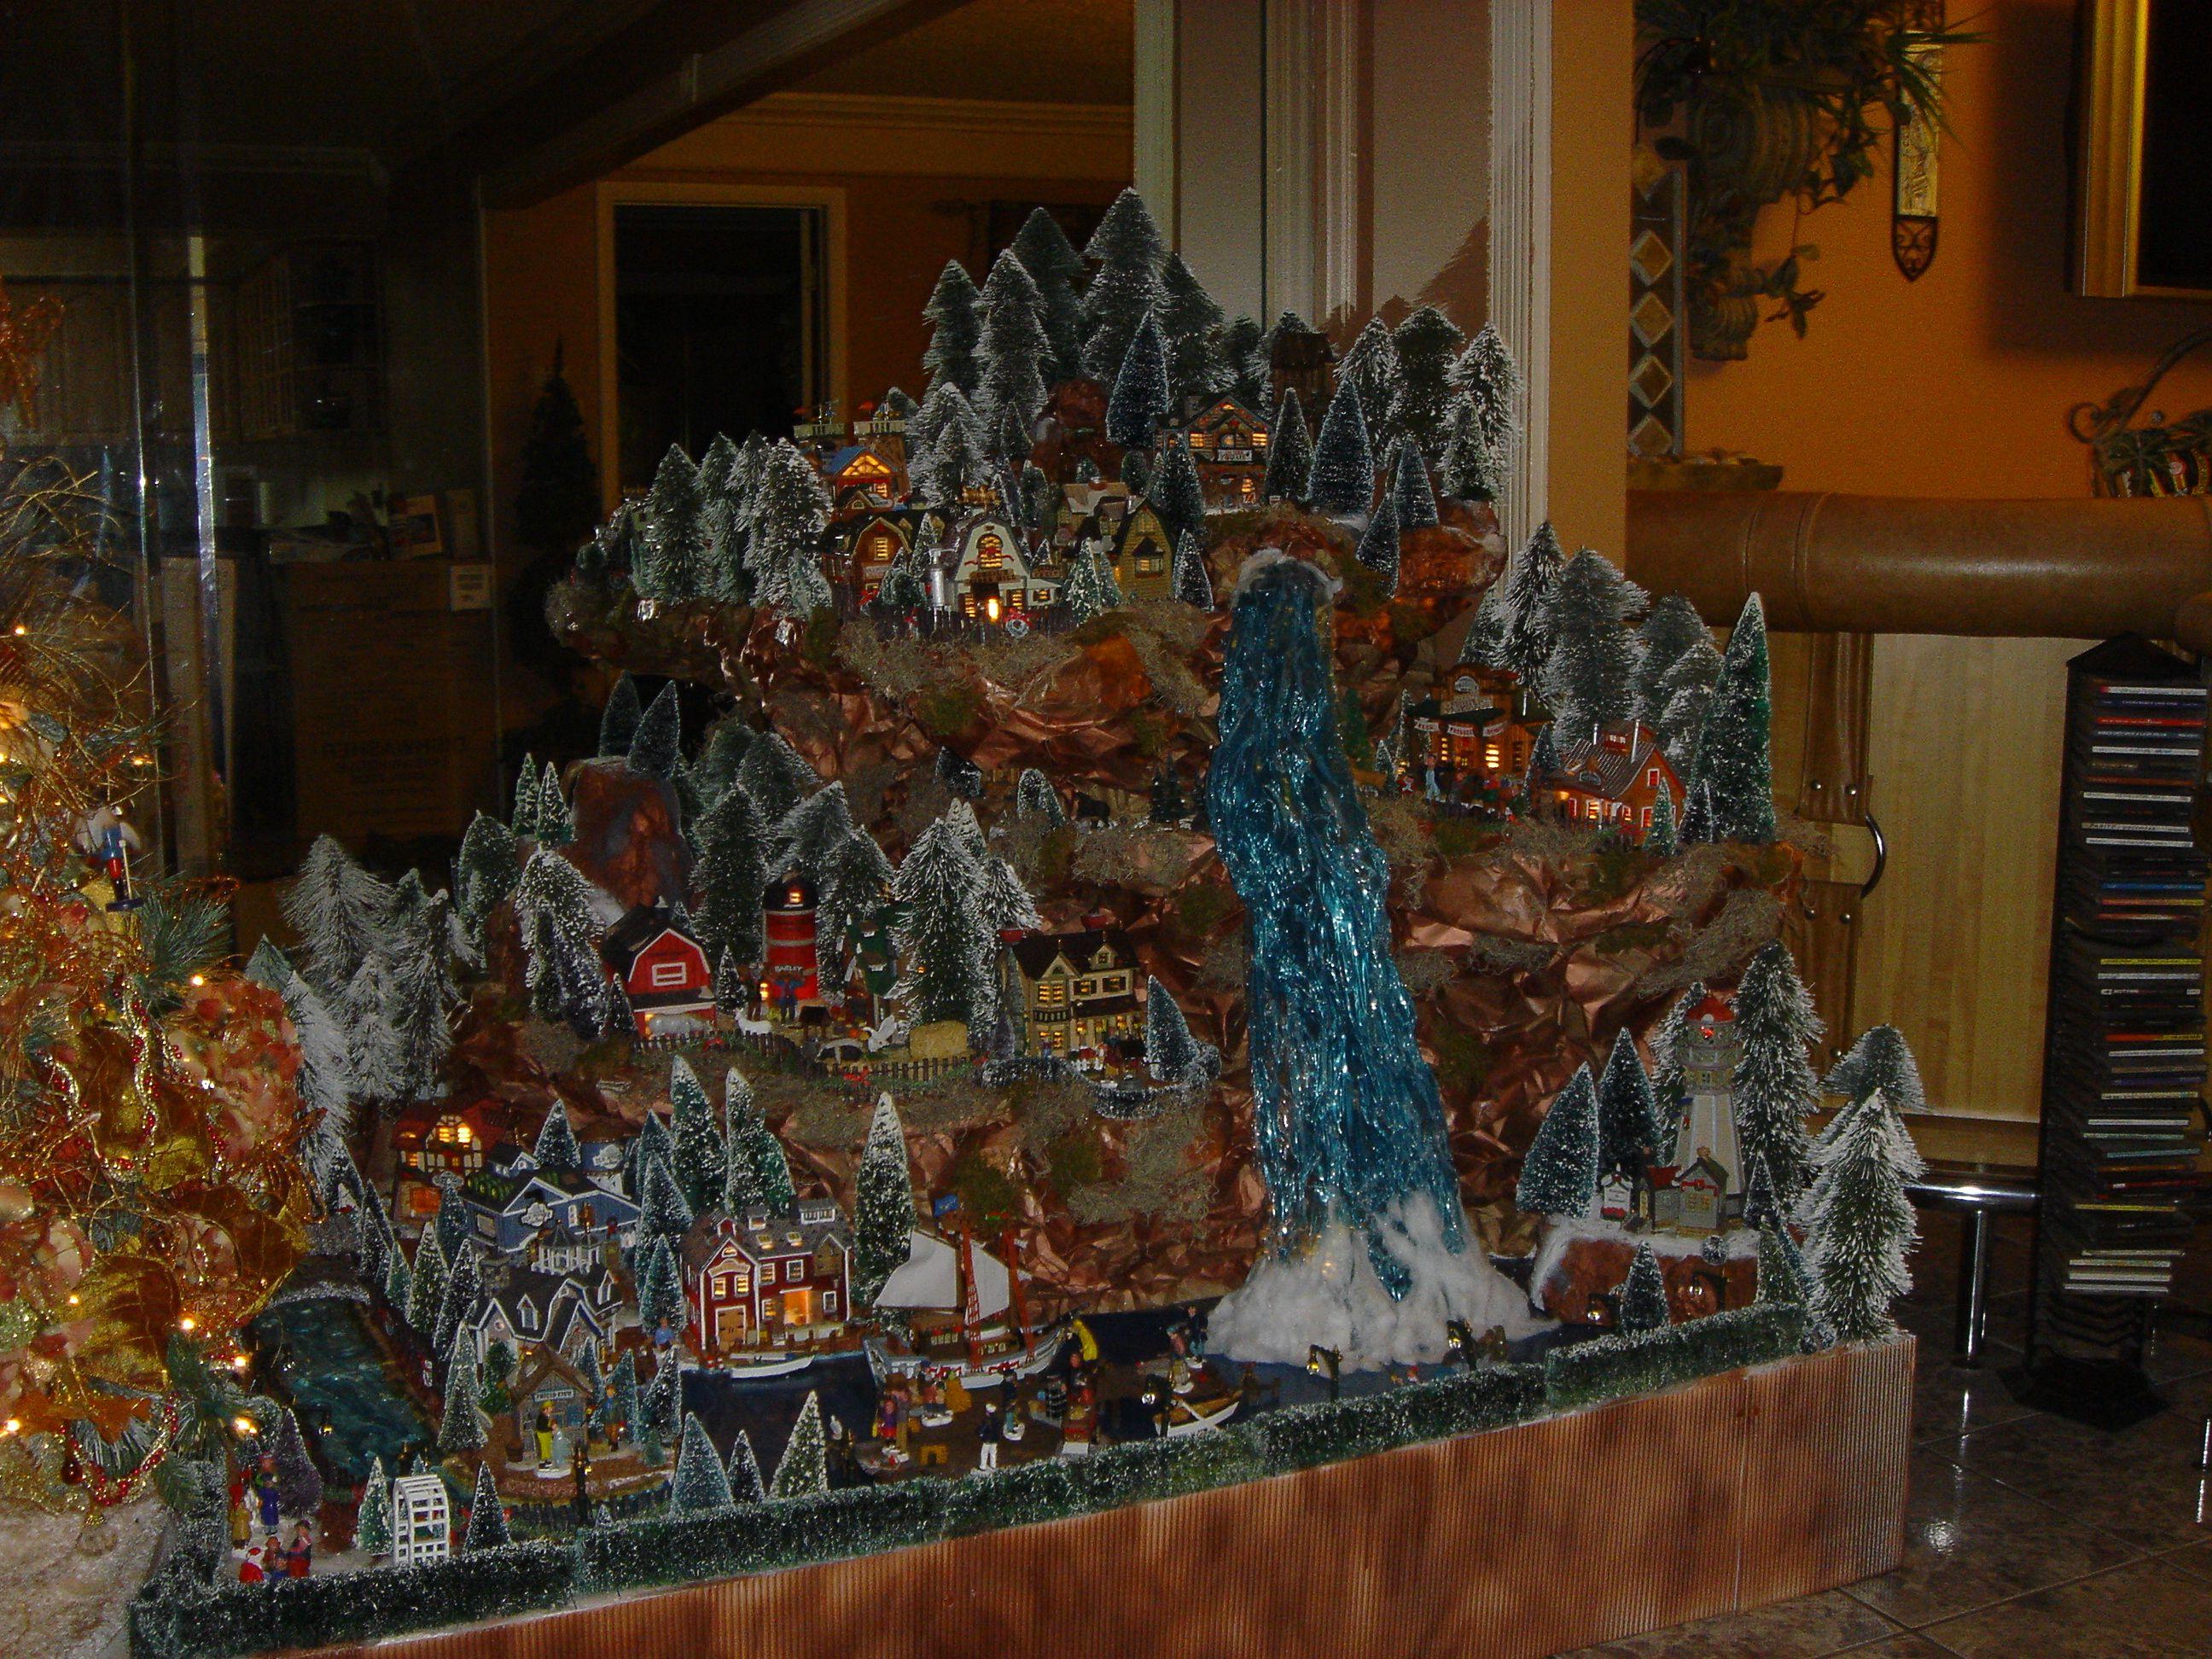 Large Christmas Village Display